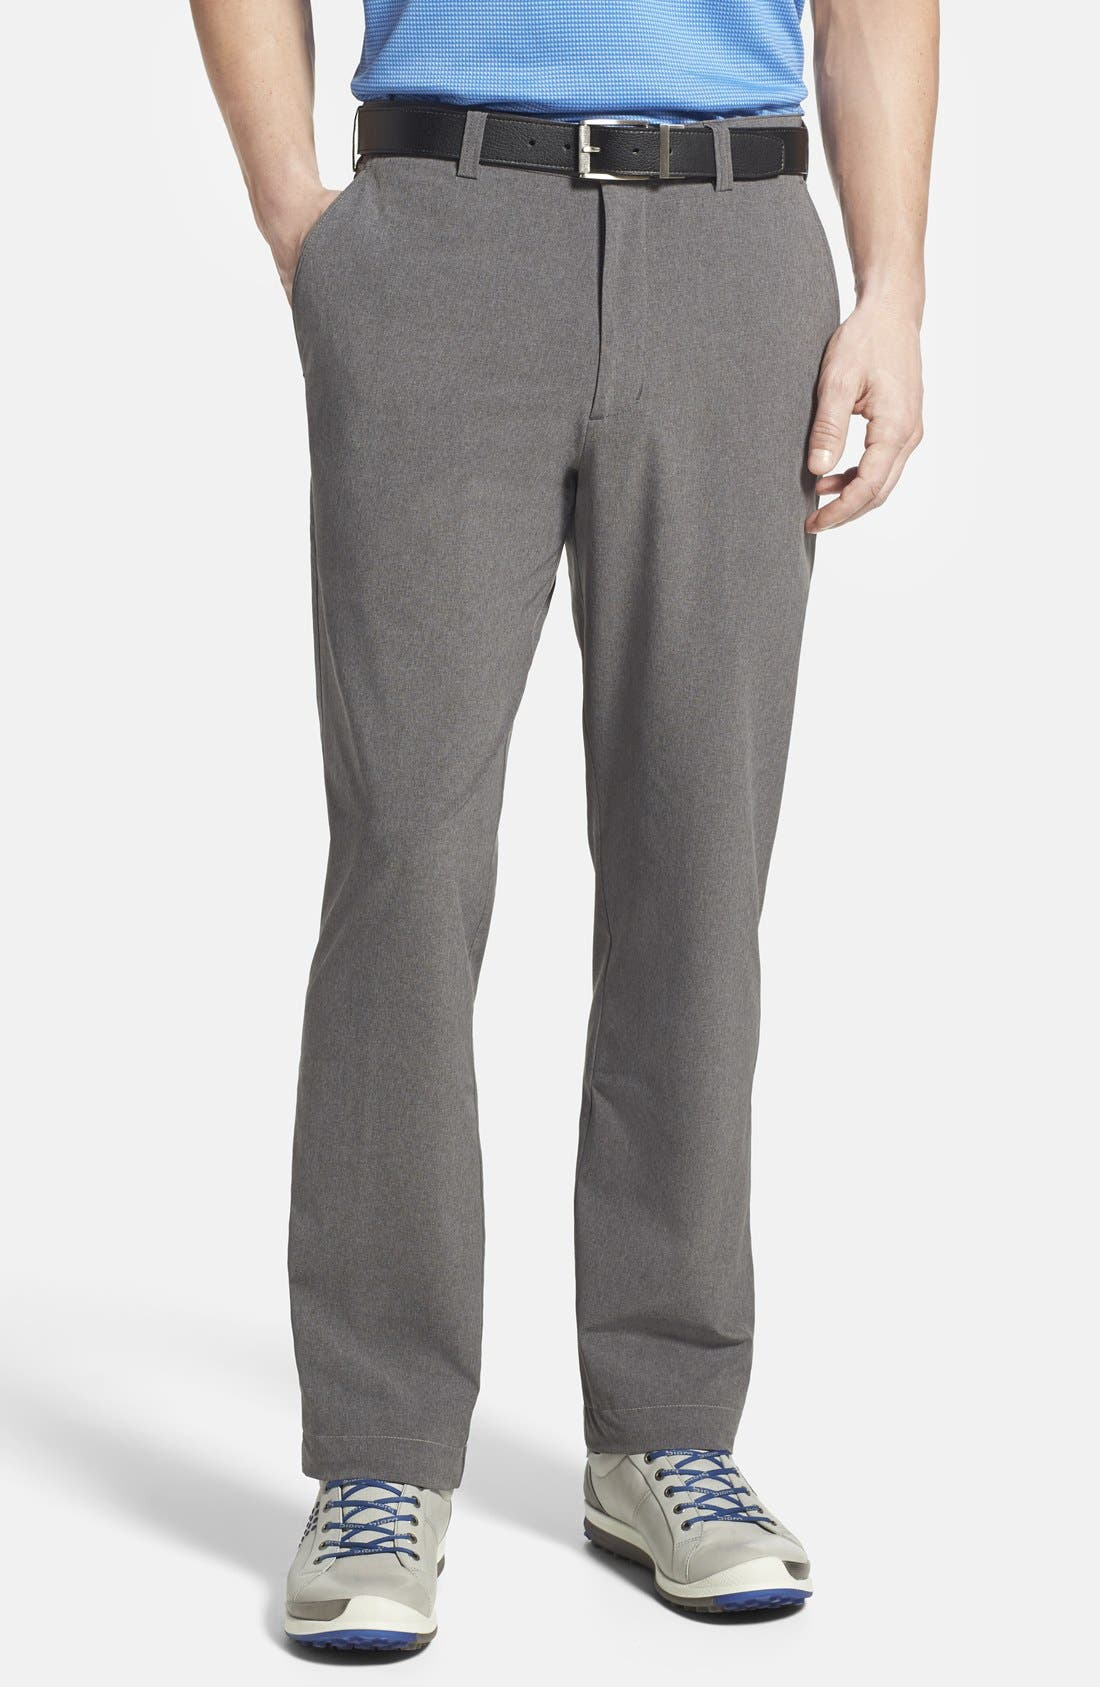 CUTTER & BUCK, 'Bainbridge' DryTec Flat Front Pants, Main thumbnail 1, color, IRON GREY